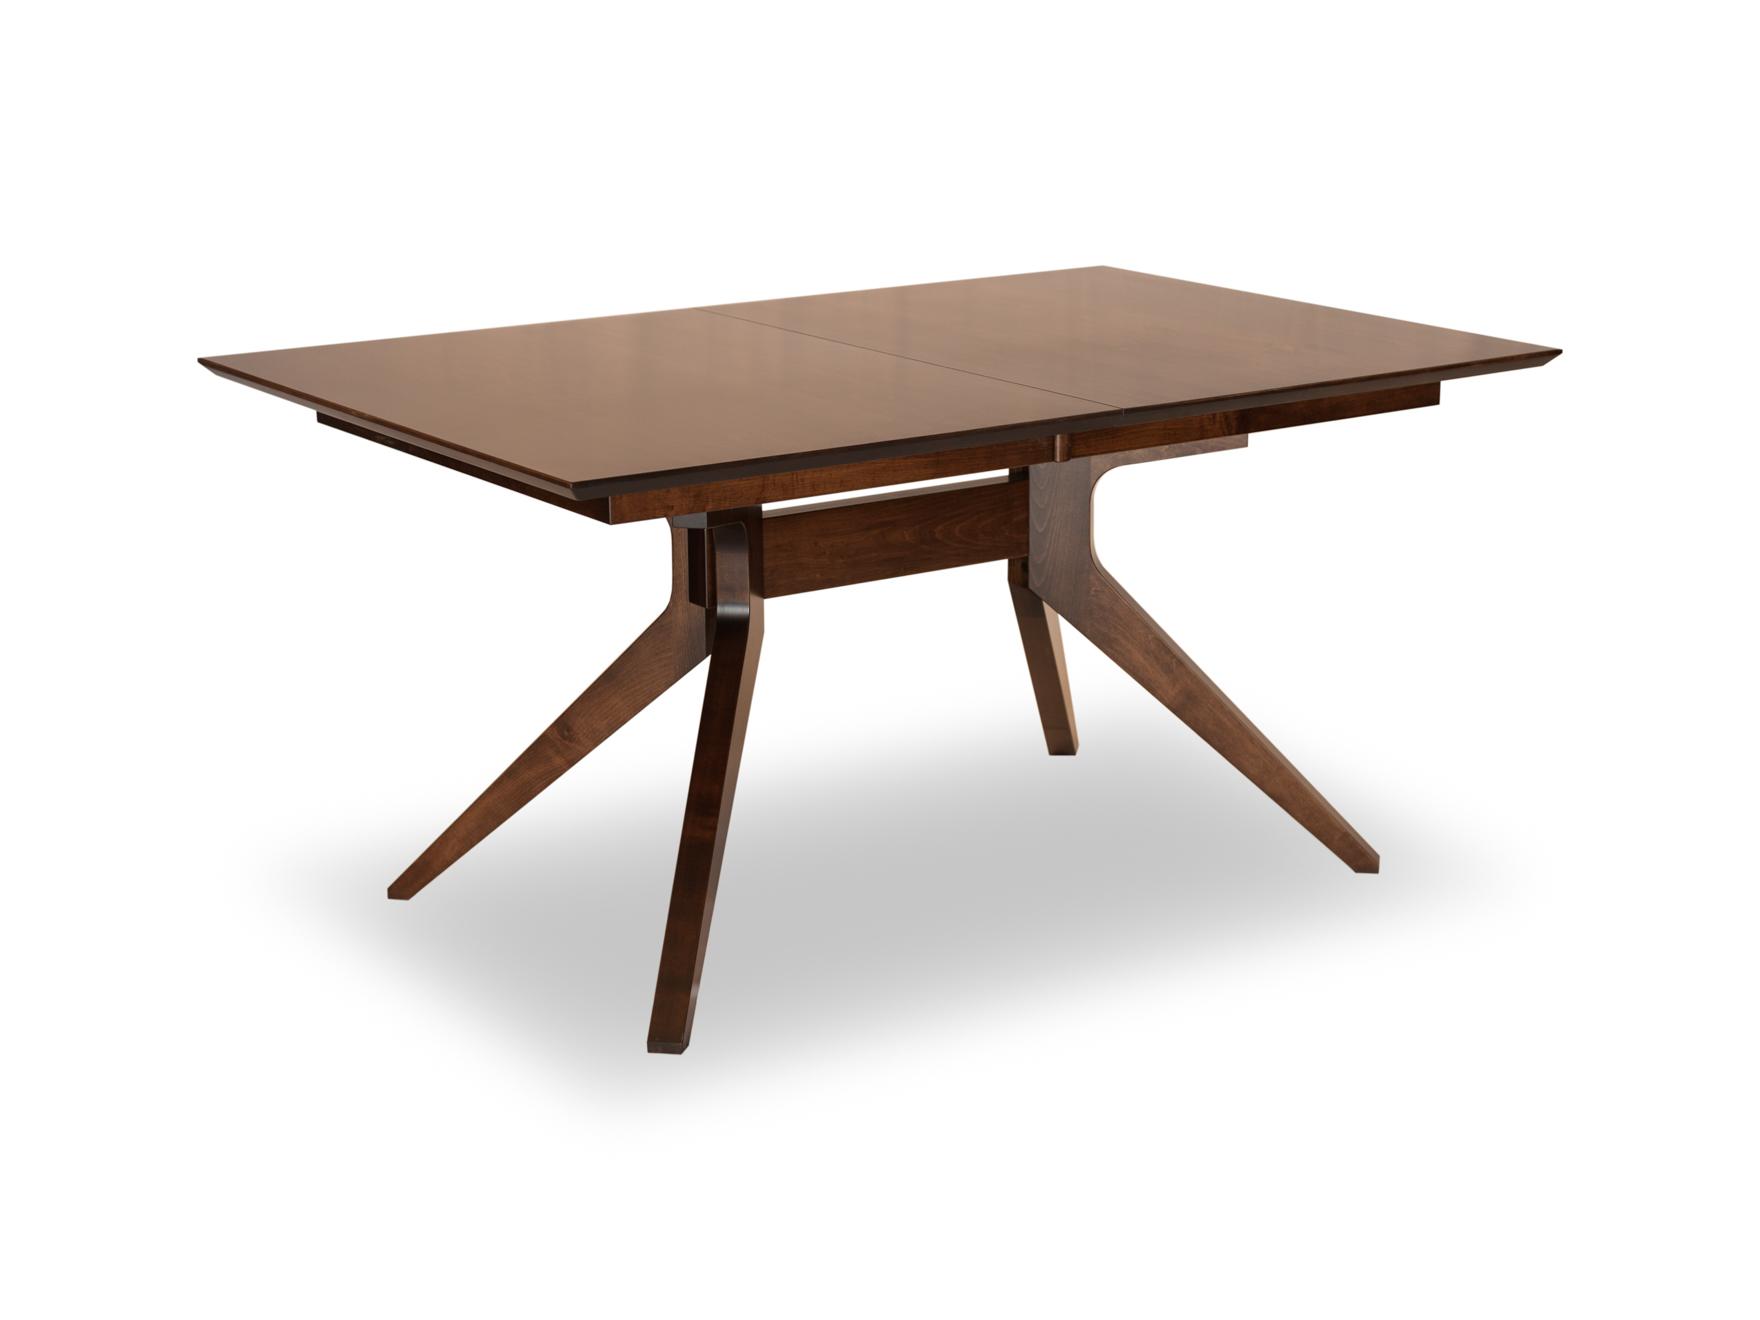 010_Woodcraft_Furniture_MalmoTable_FrtQtrC-1-1.jpg